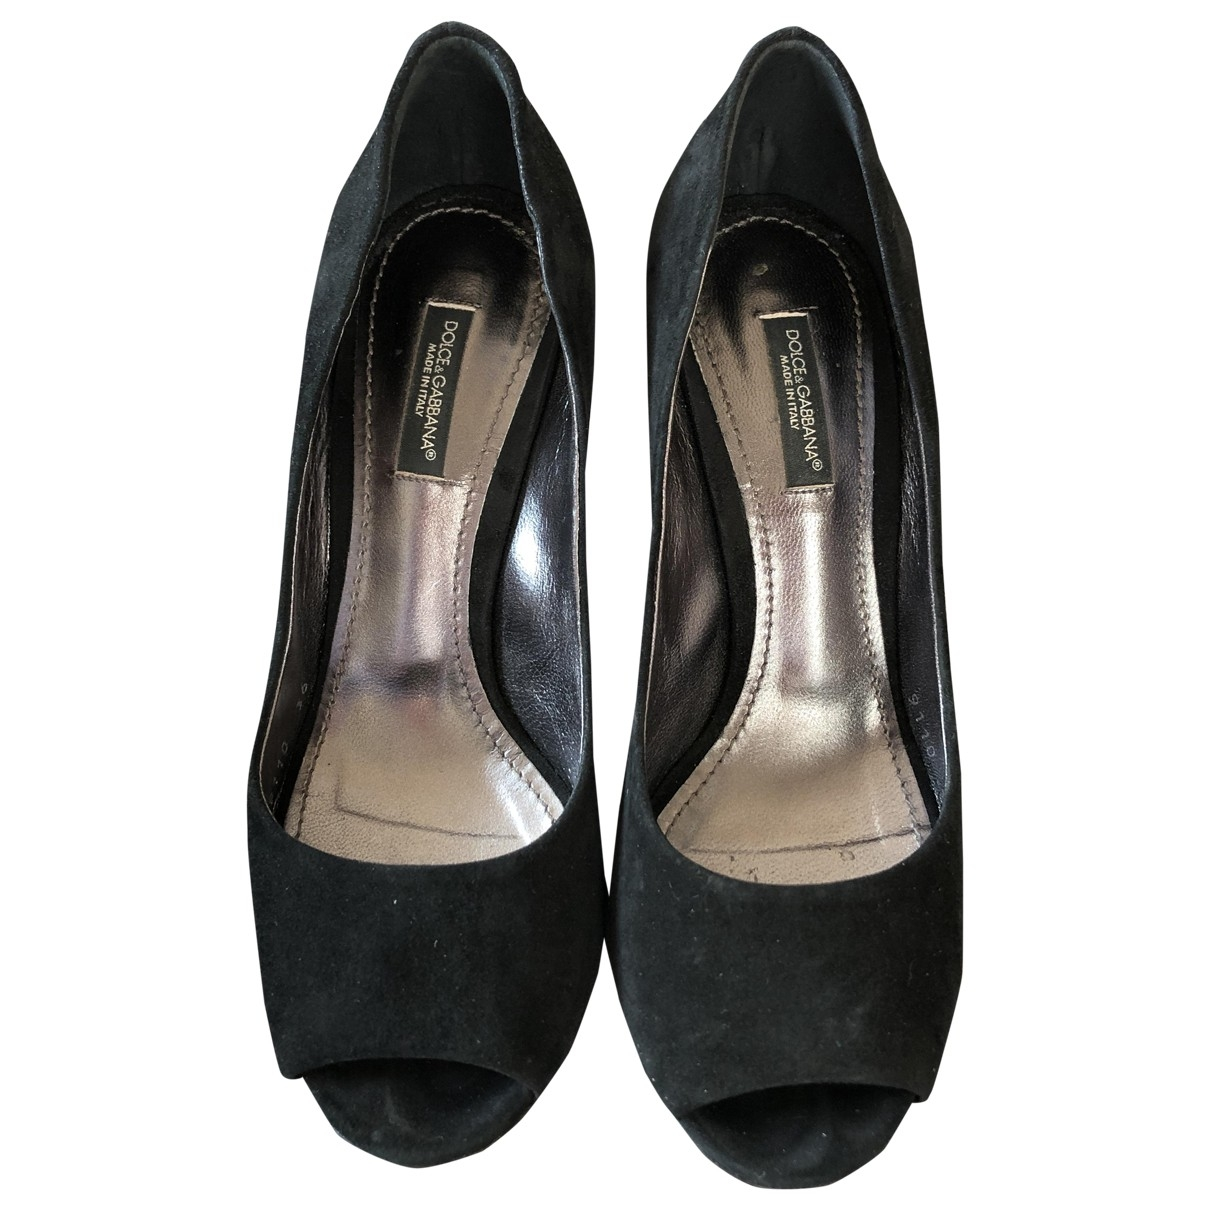 D&g \N Black Suede Heels for Women 36 EU